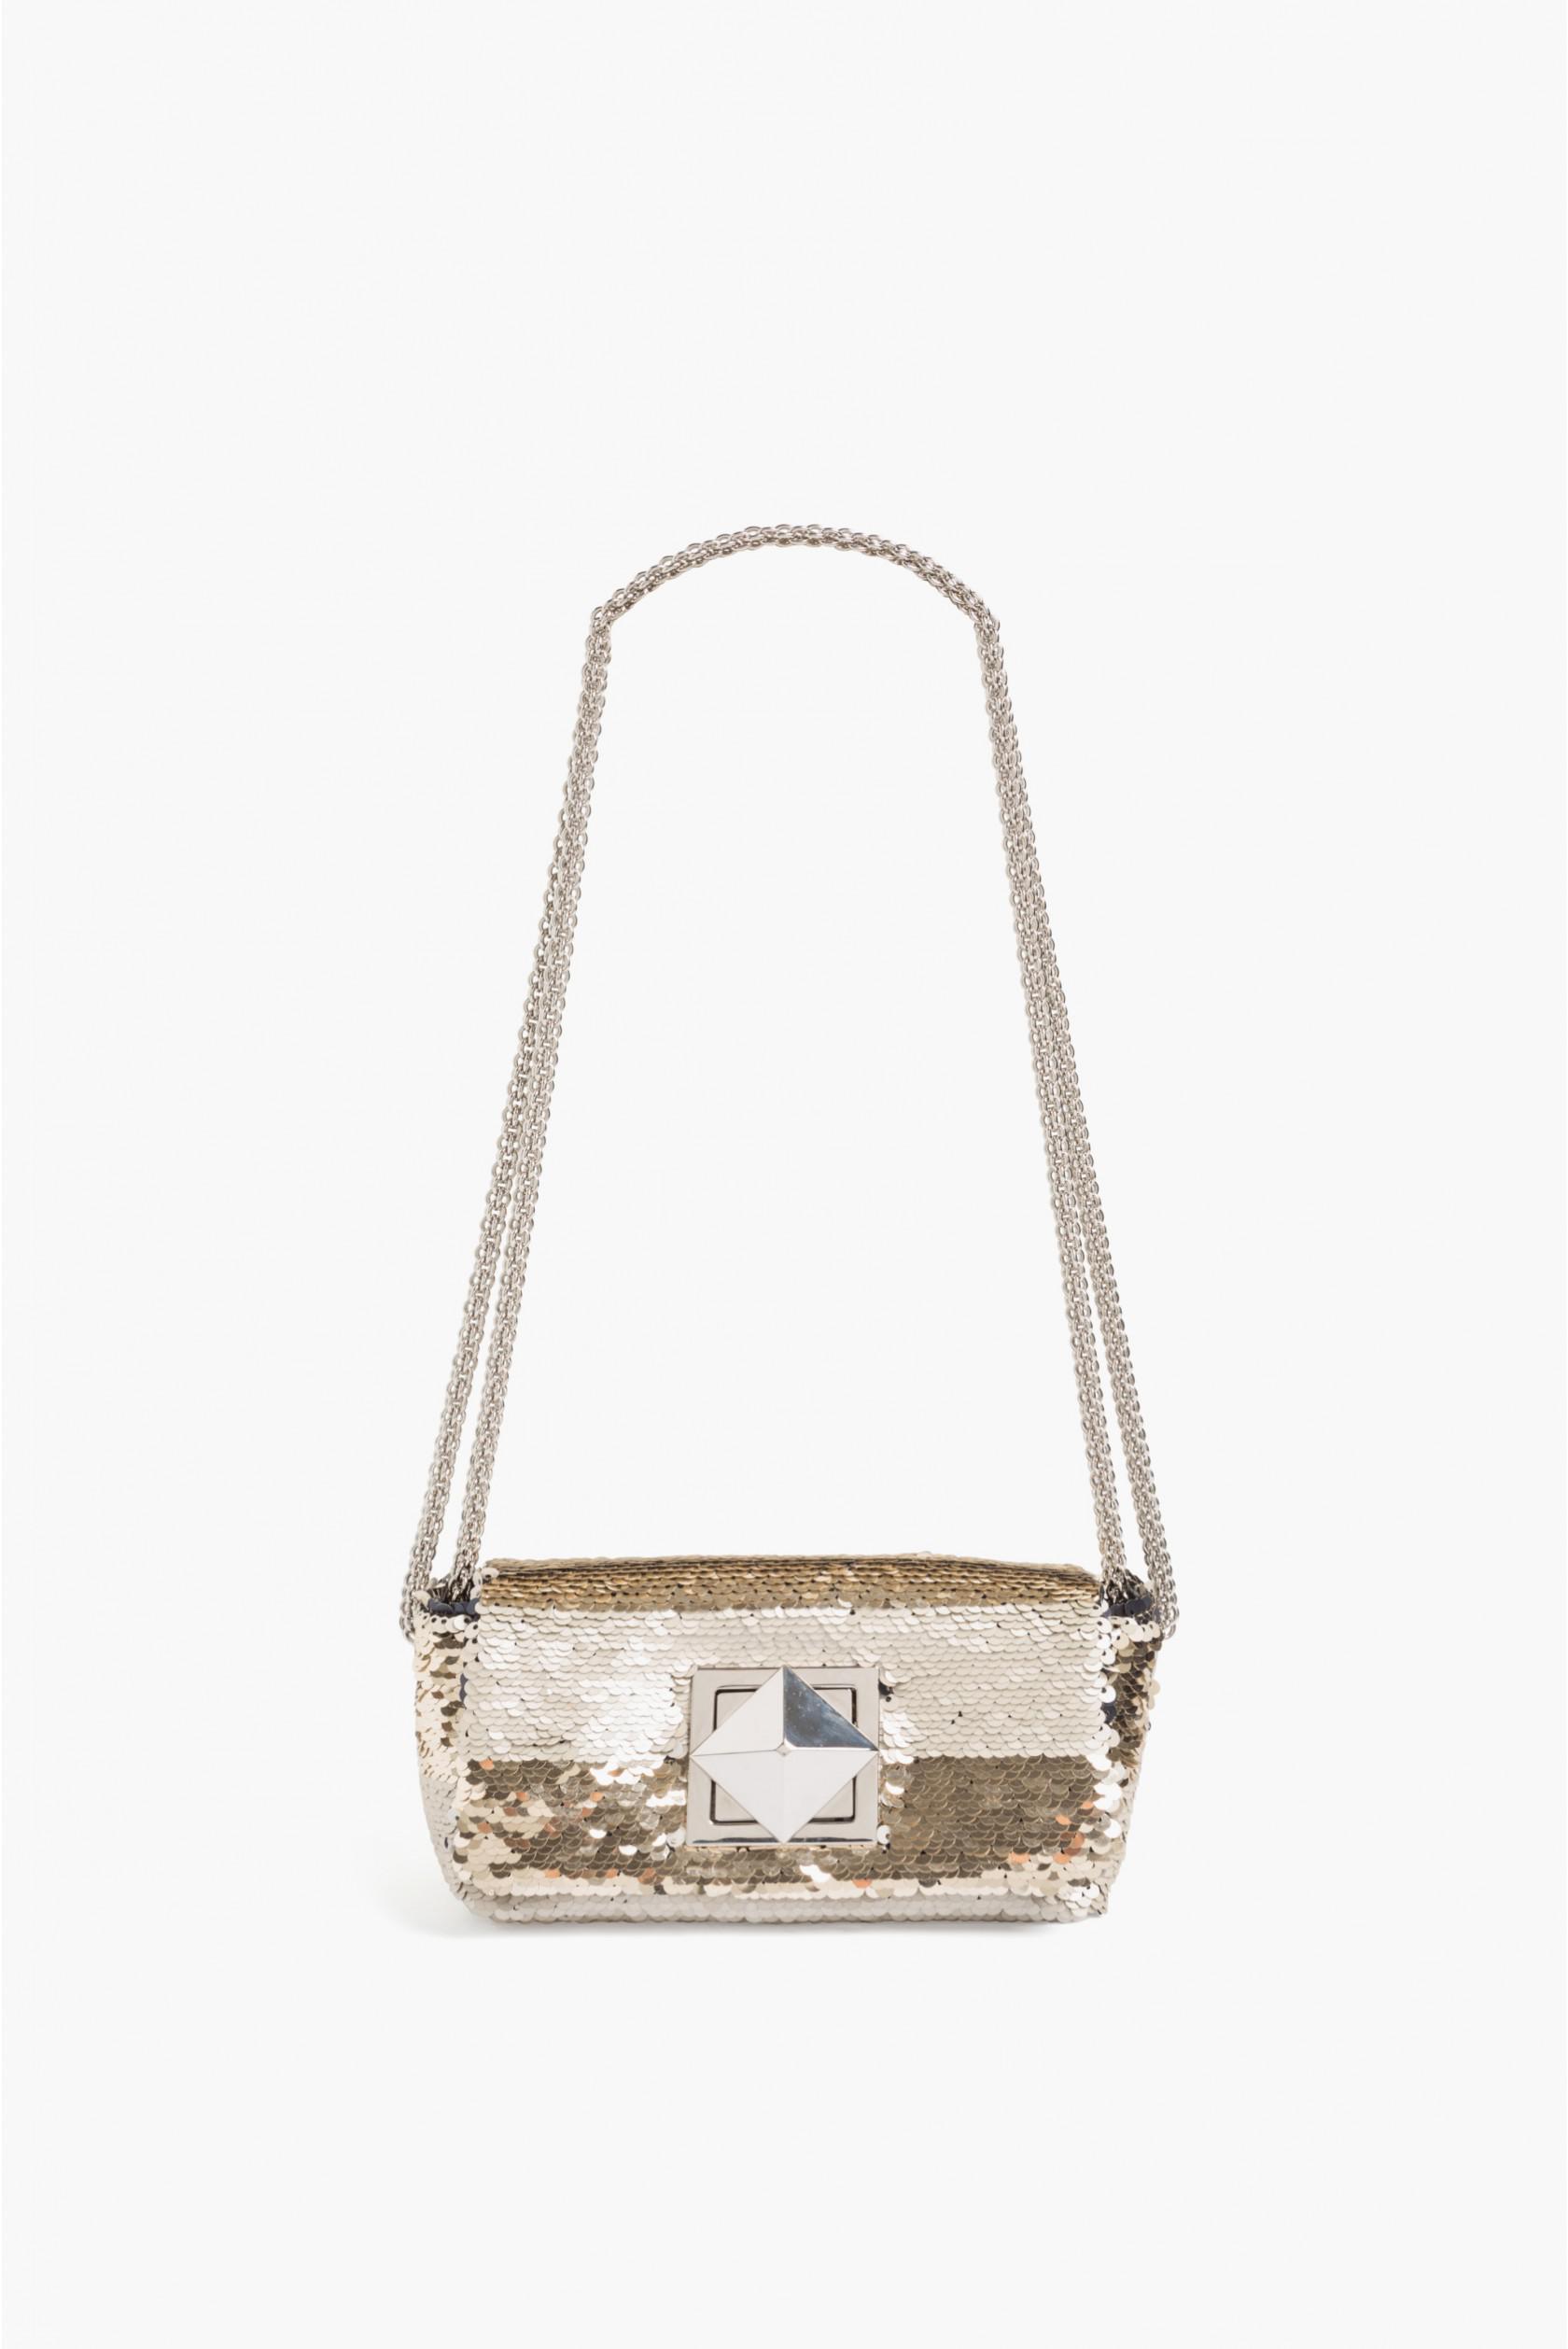 0368bd58f7 Lyst - Sonia Rykiel Le Copain Two-tone Sequin Bag